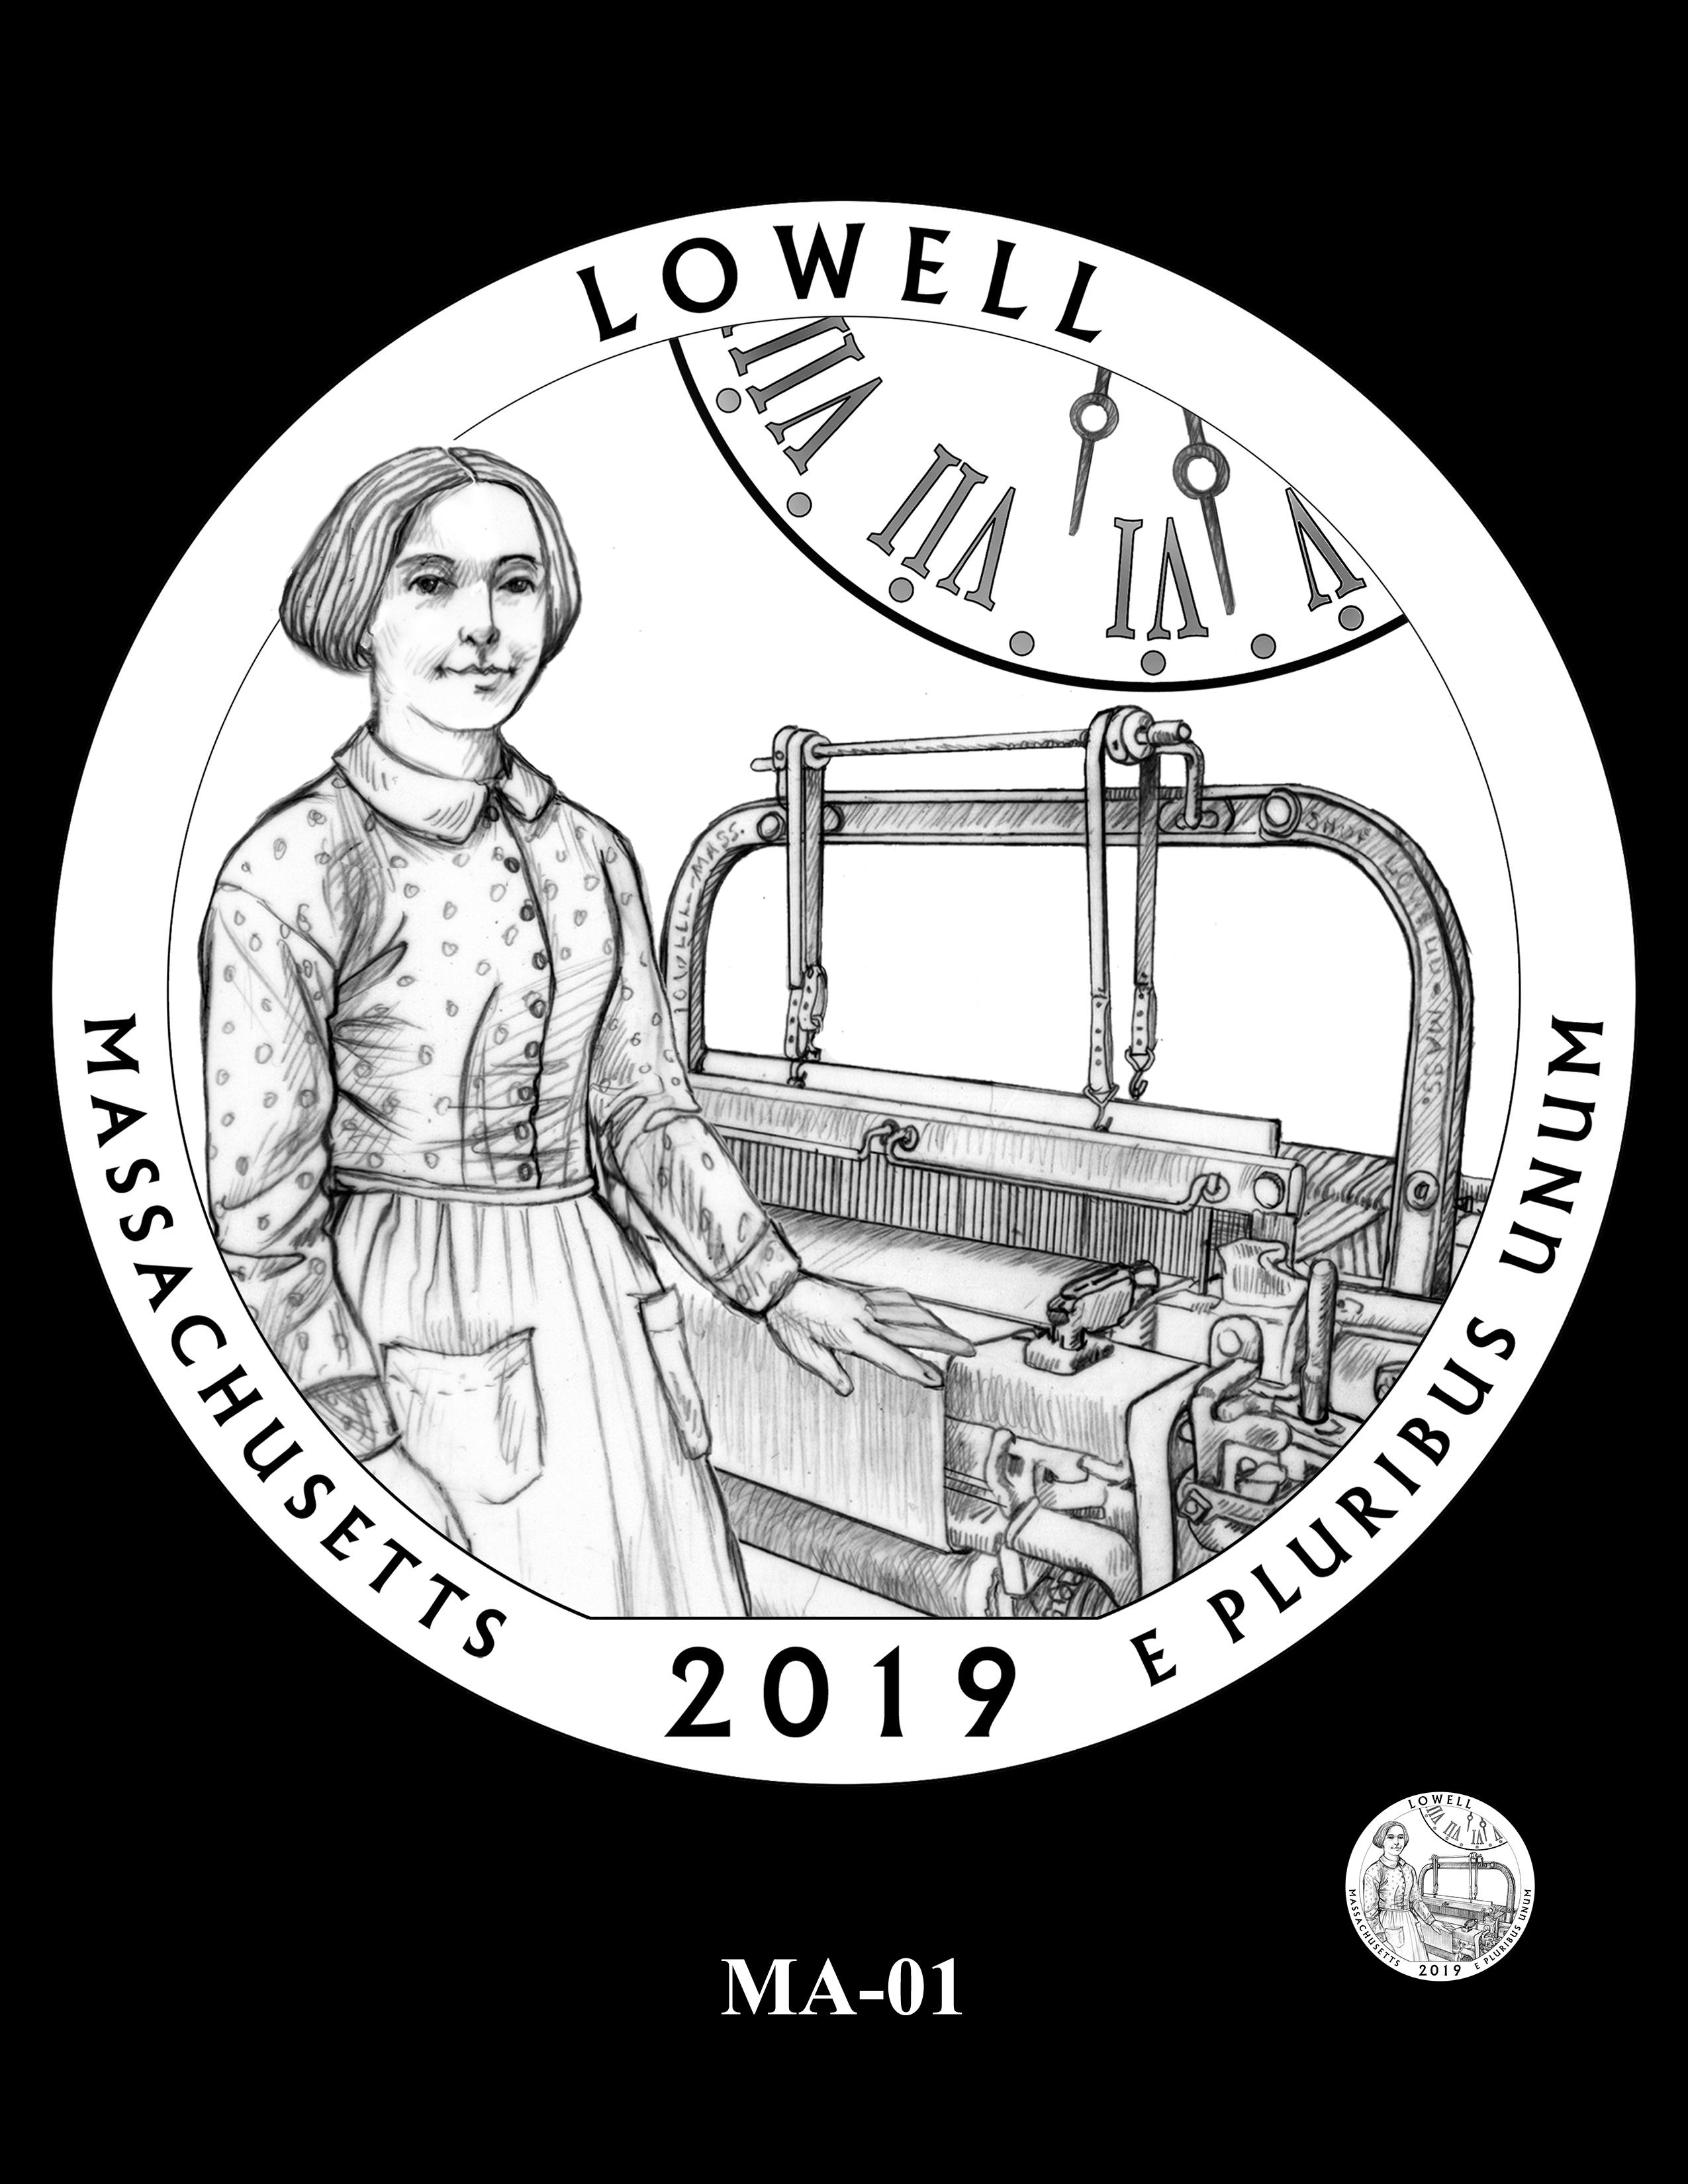 MA-01 -- 2019 America the Beautiful Quarters® Program